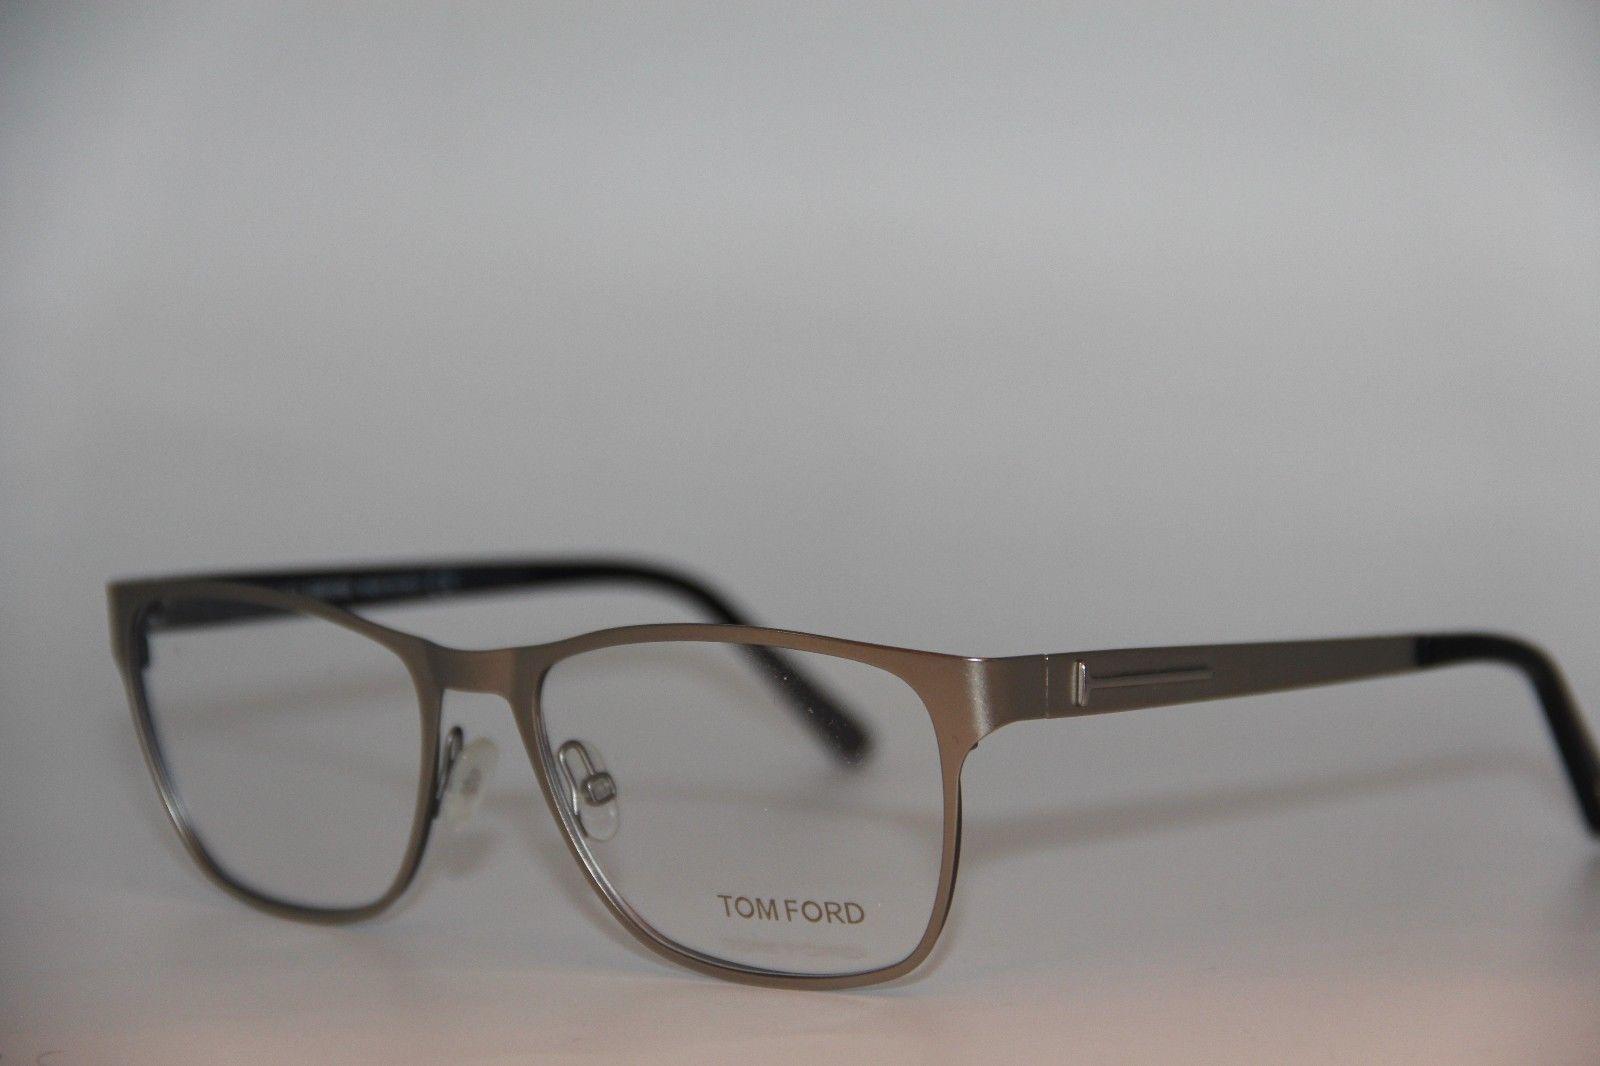 c69a2608821d New Tom Ford Tf 5242 020 Gunmetal Eyeglasses and 50 similar items. 57